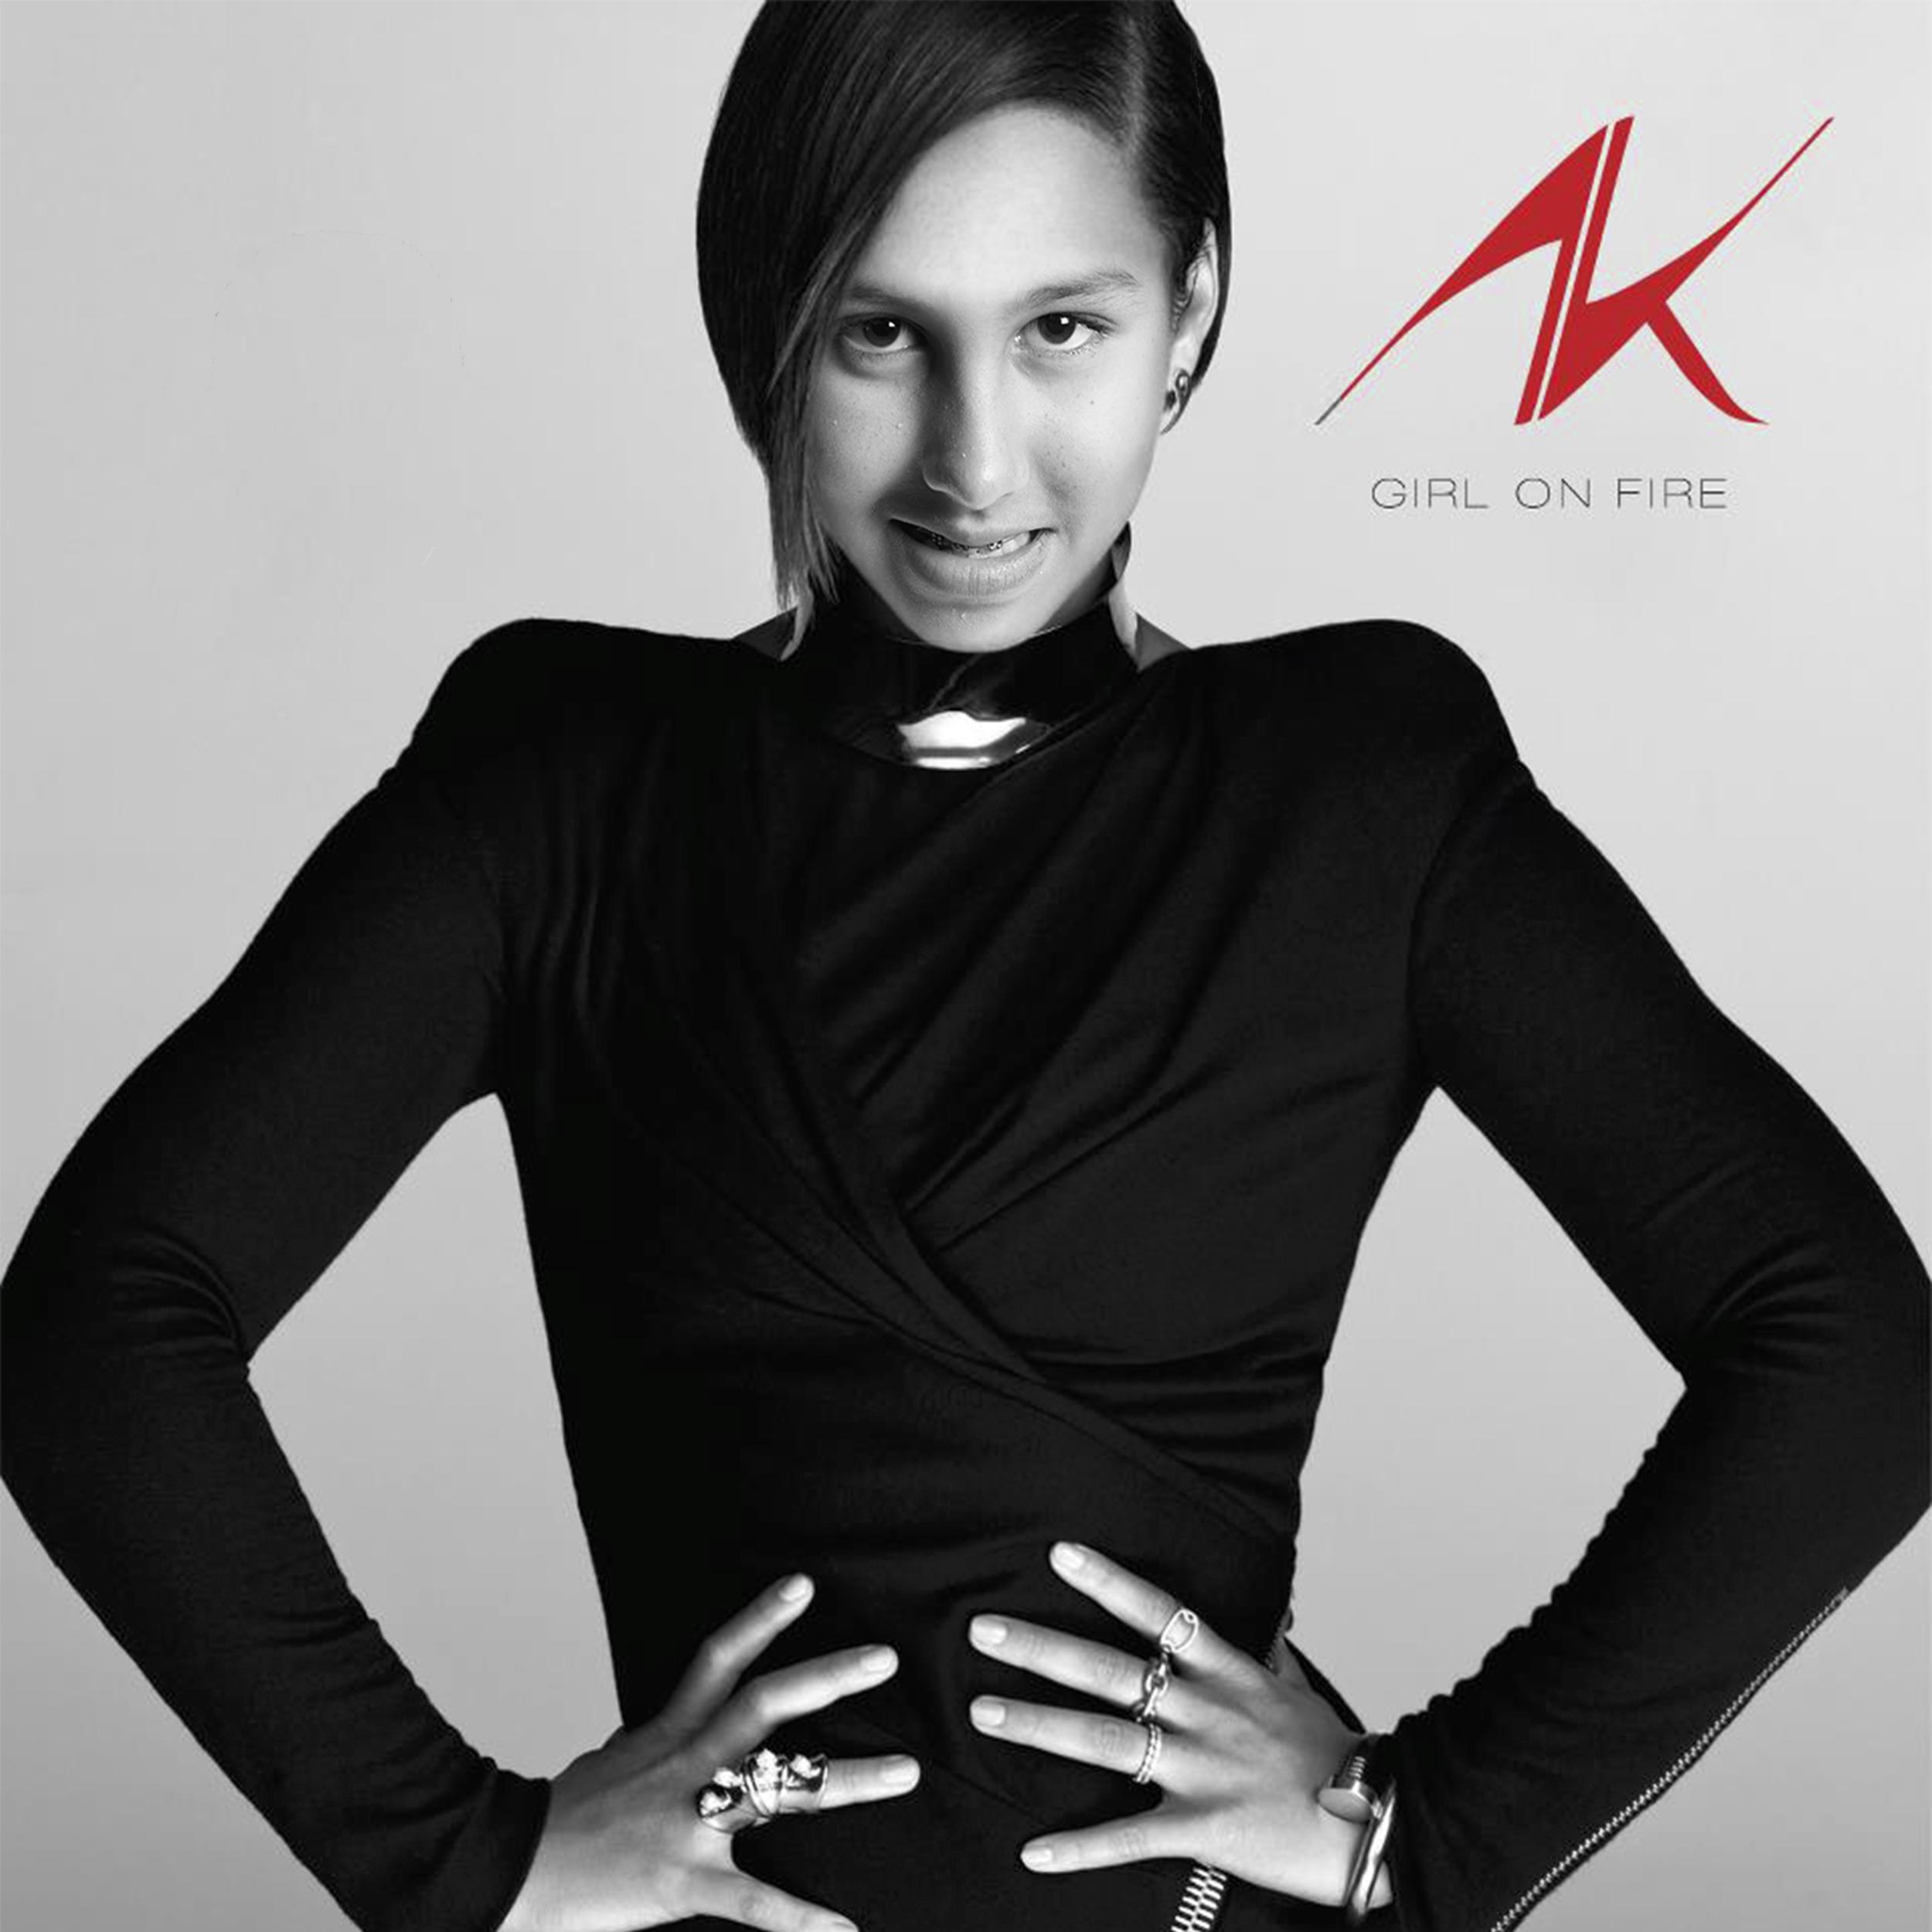 6.3 anisha  photoshop alicia keys girl on fire - edit.png